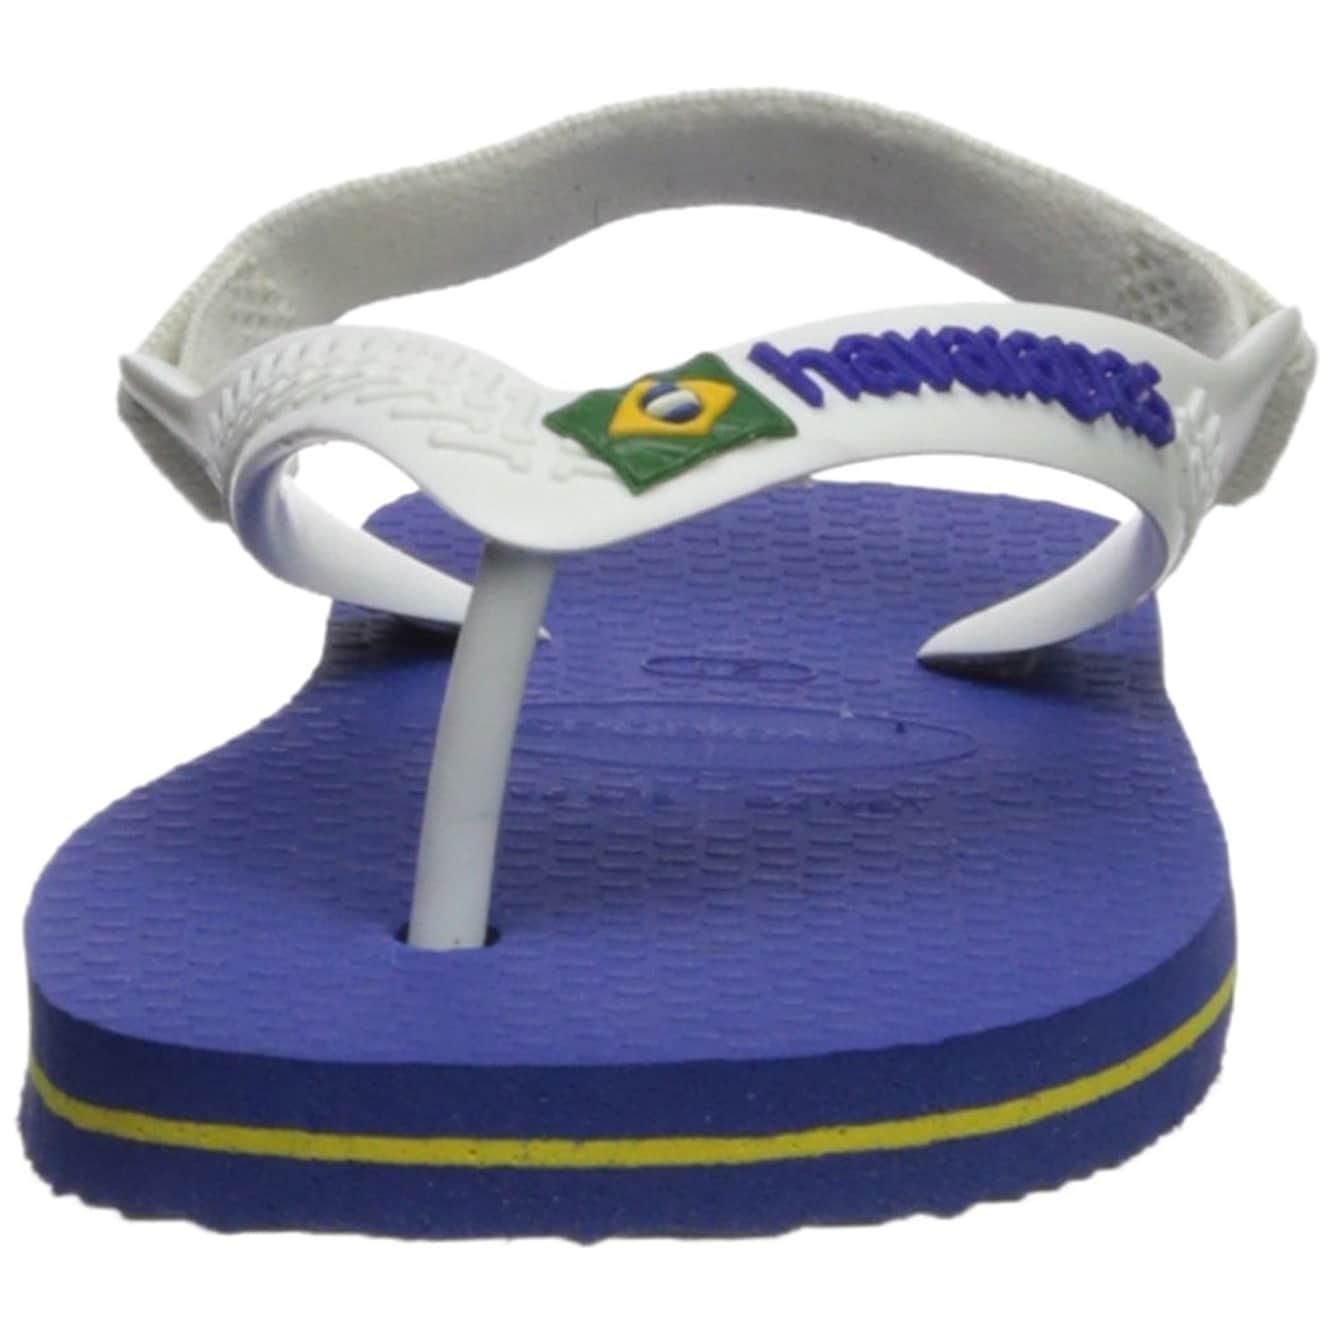 975f68e4fb55e3 Shop Havaianas Kids  Baby Brazil Logo Sandal Marine Blue - On Sale - Free  Shipping On Orders Over  45 - Overstock.com - 22133157